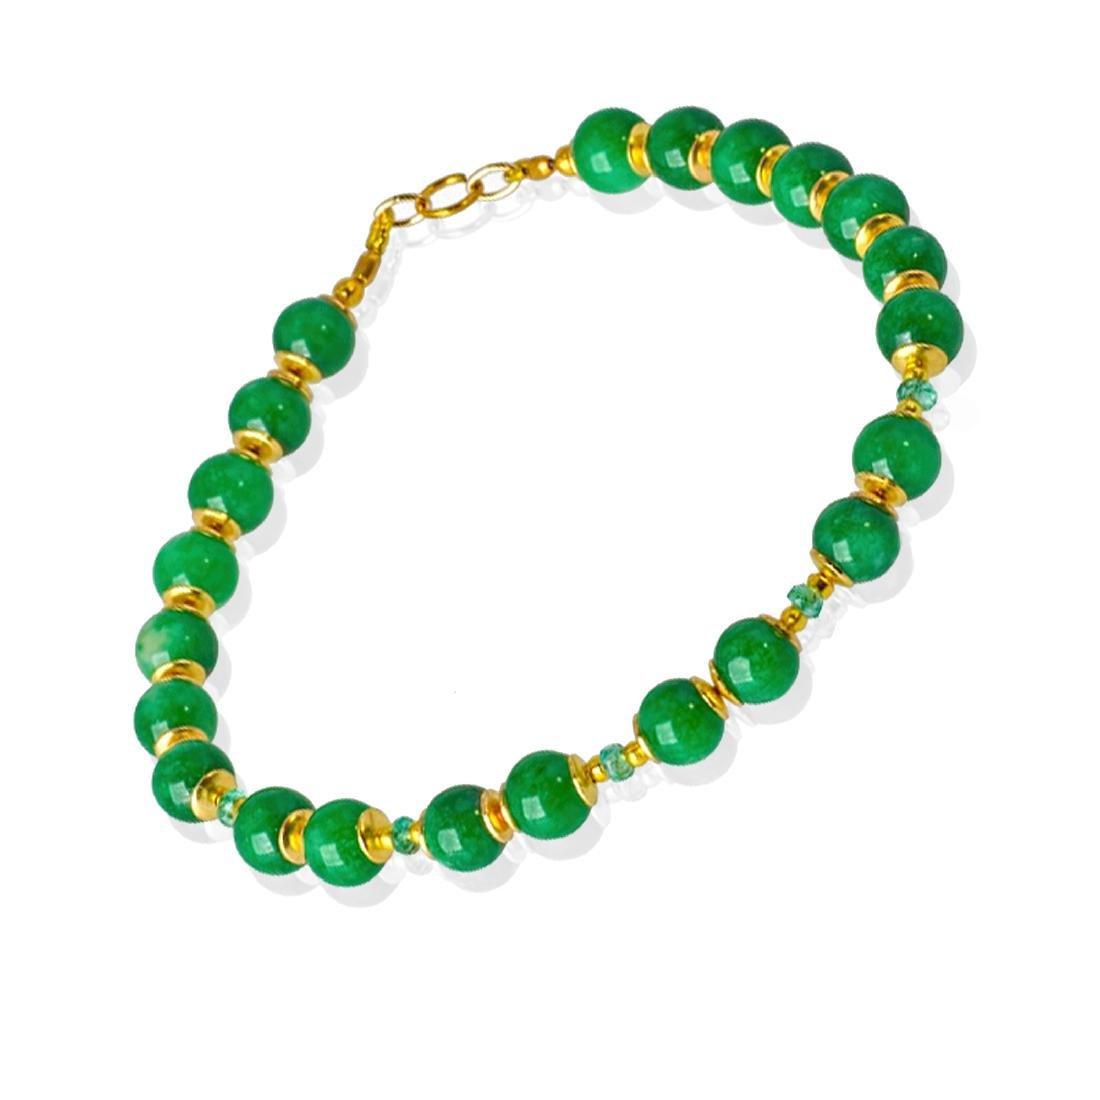 14K Gold Imperial Emerald Green Jade Bracelet - 6